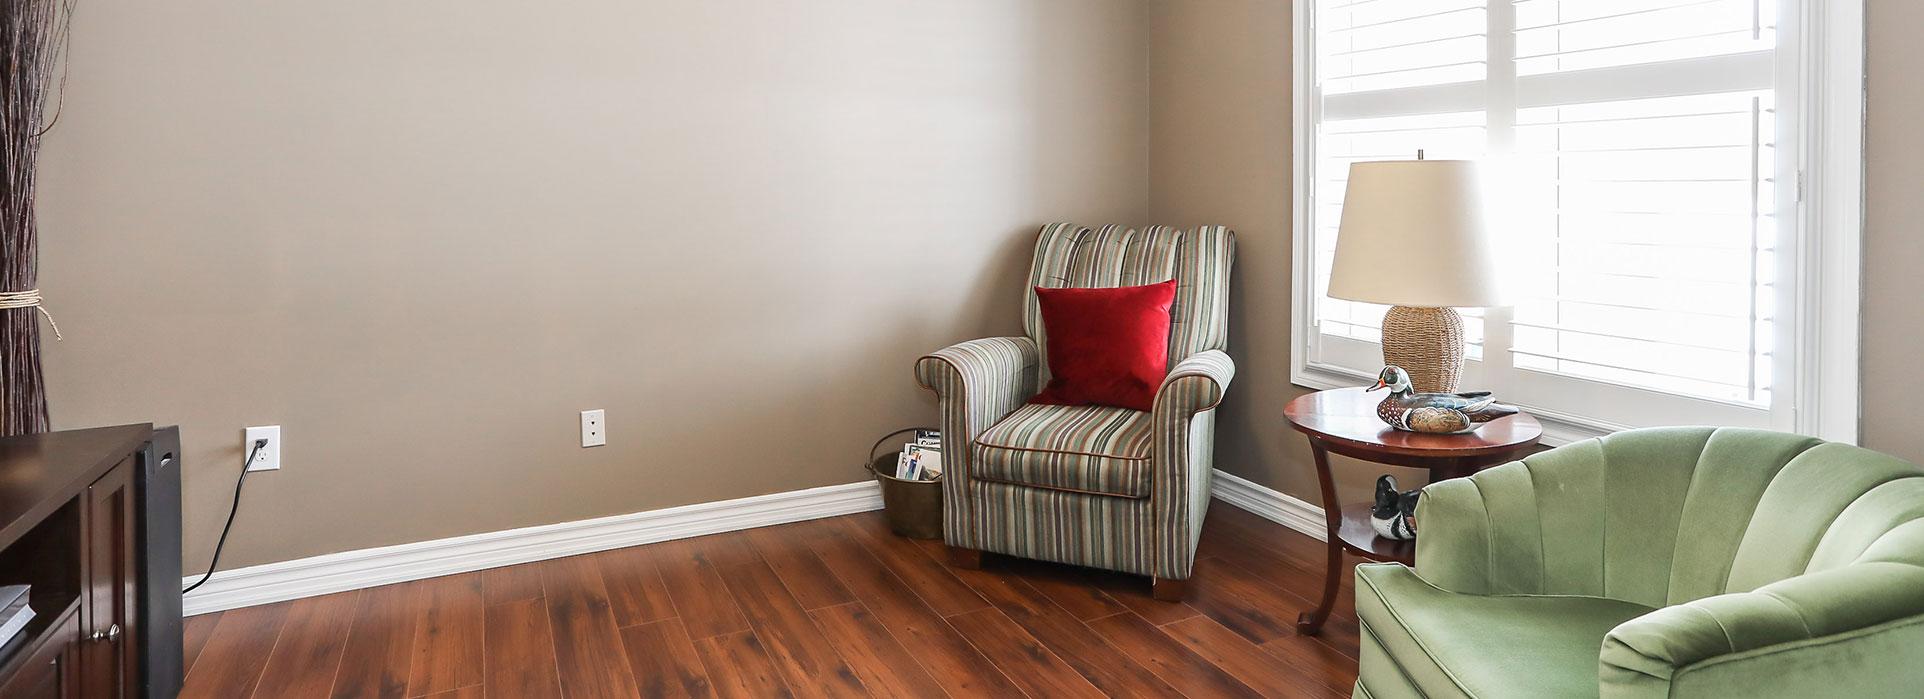 29 Merrington Avenue - Sitting Area - Cripps Realty